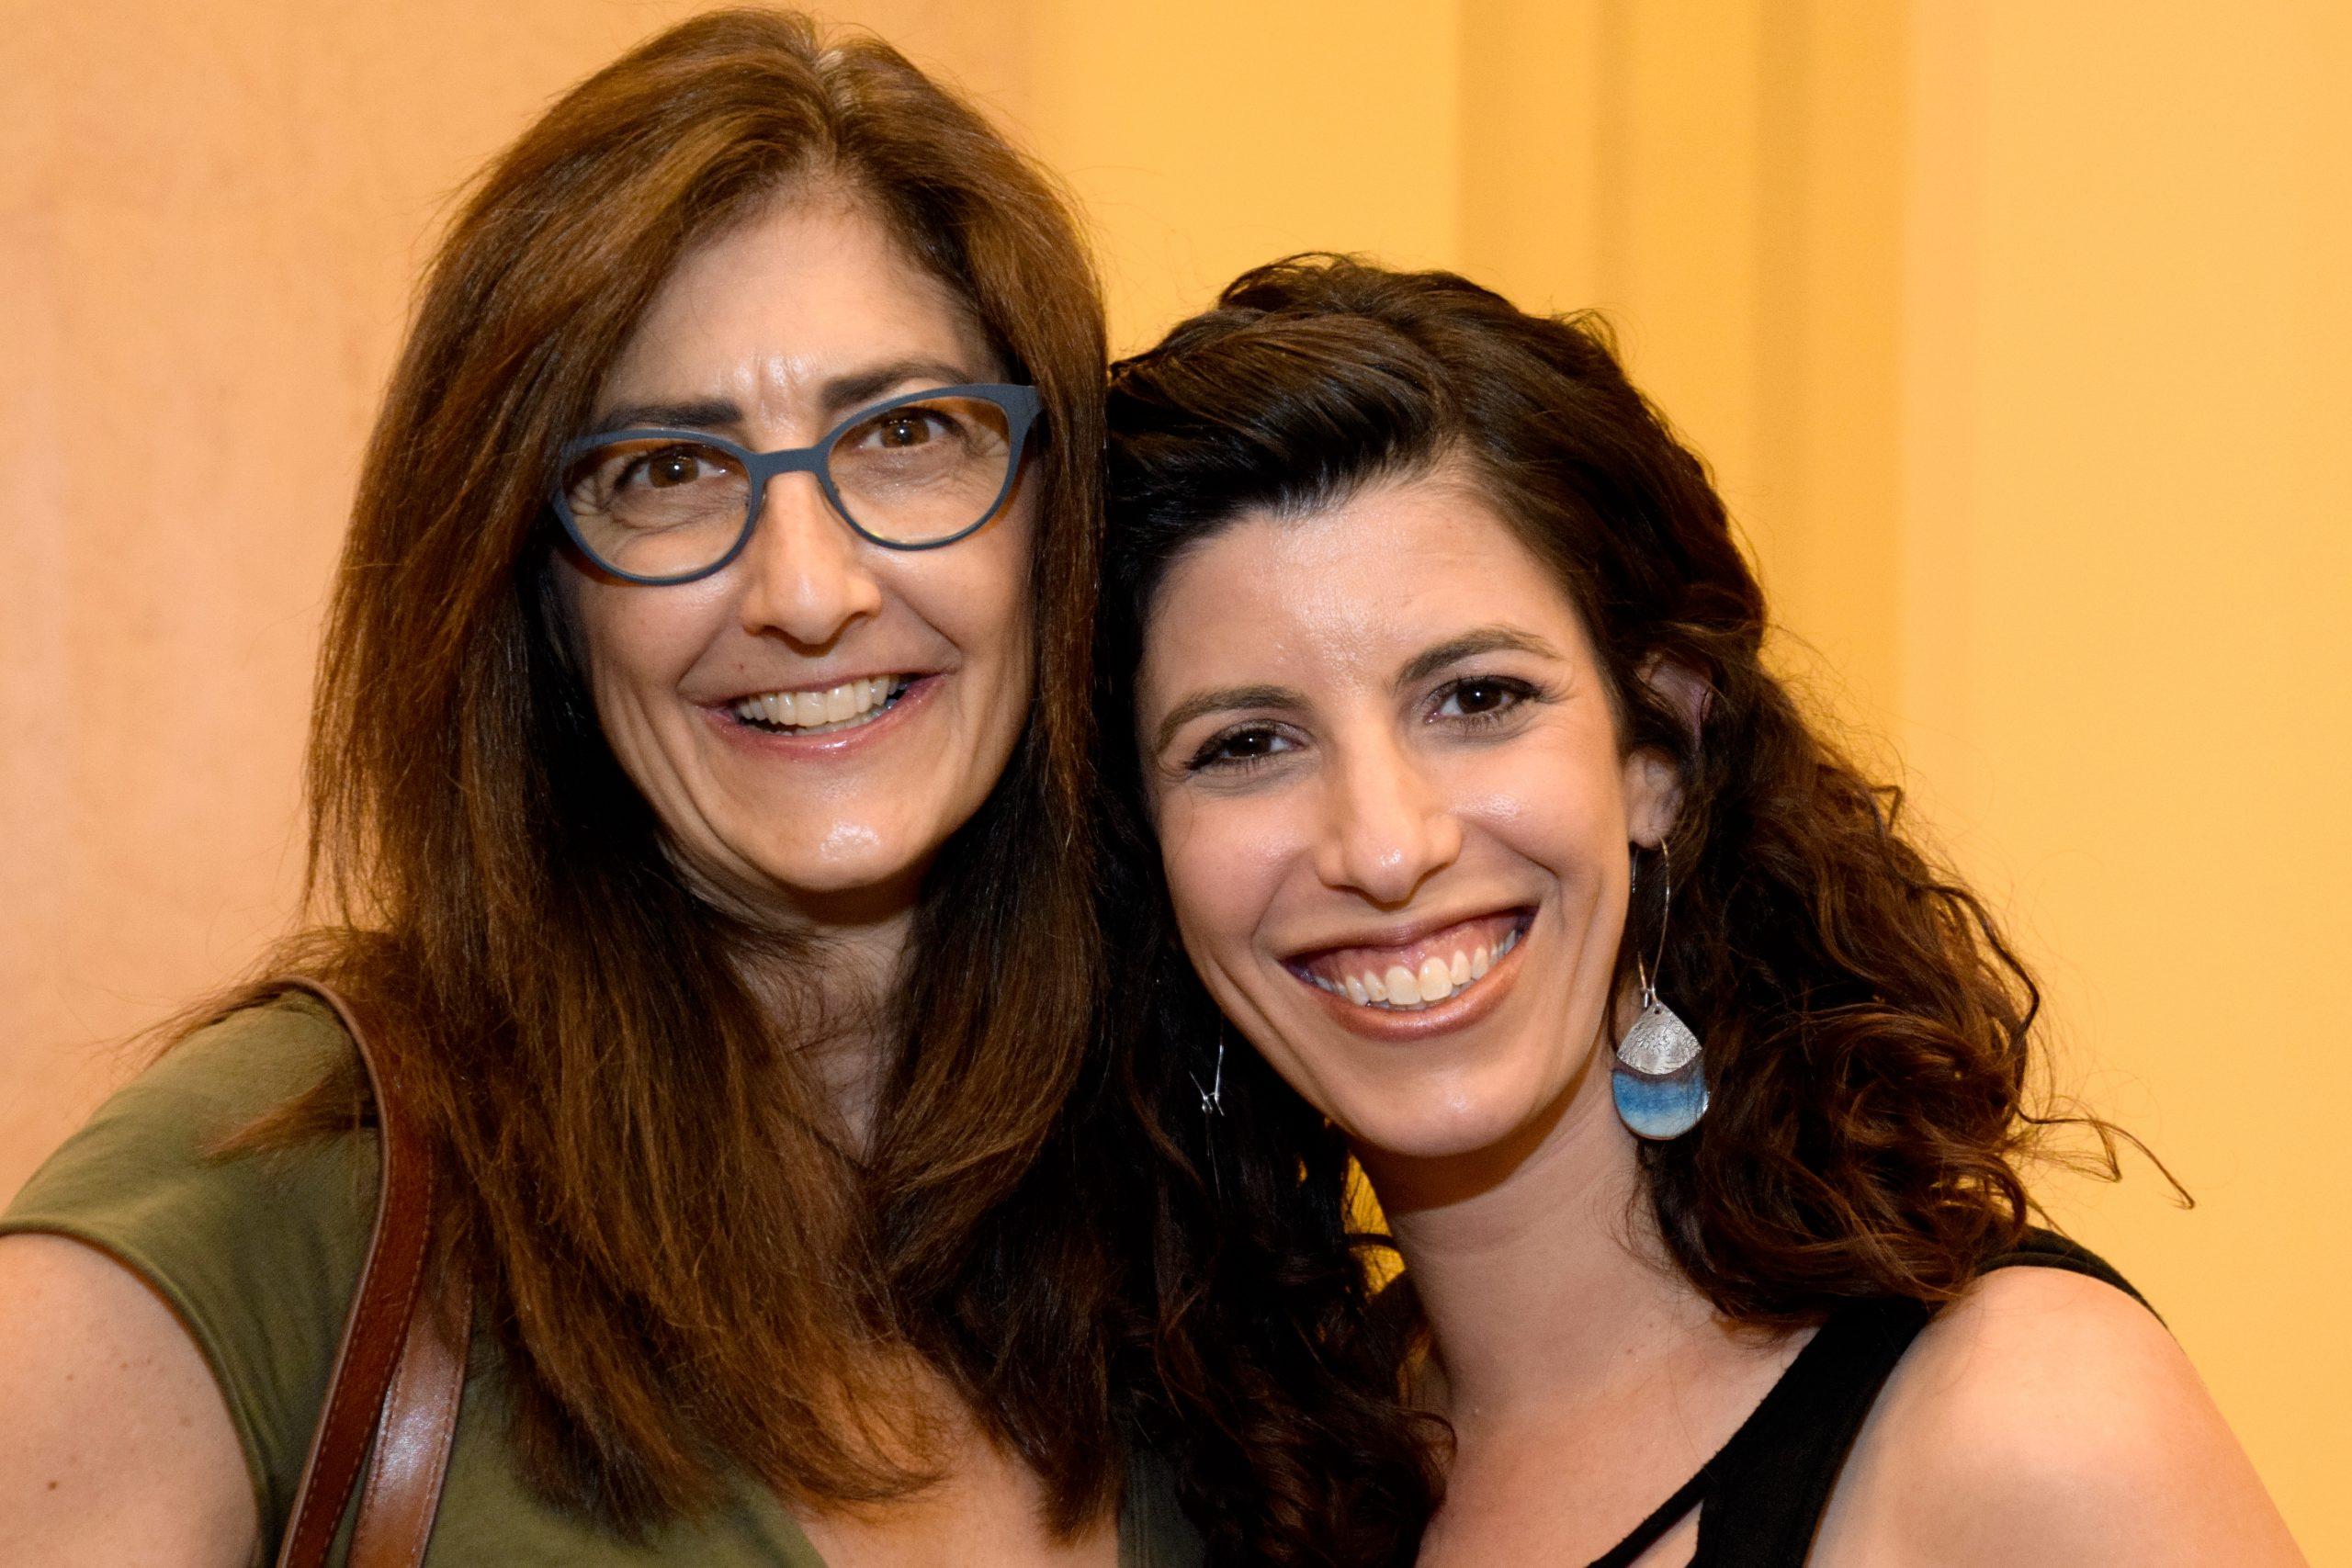 Jewish Women Change the Landscape of Communal Life Through Mentorship and Study